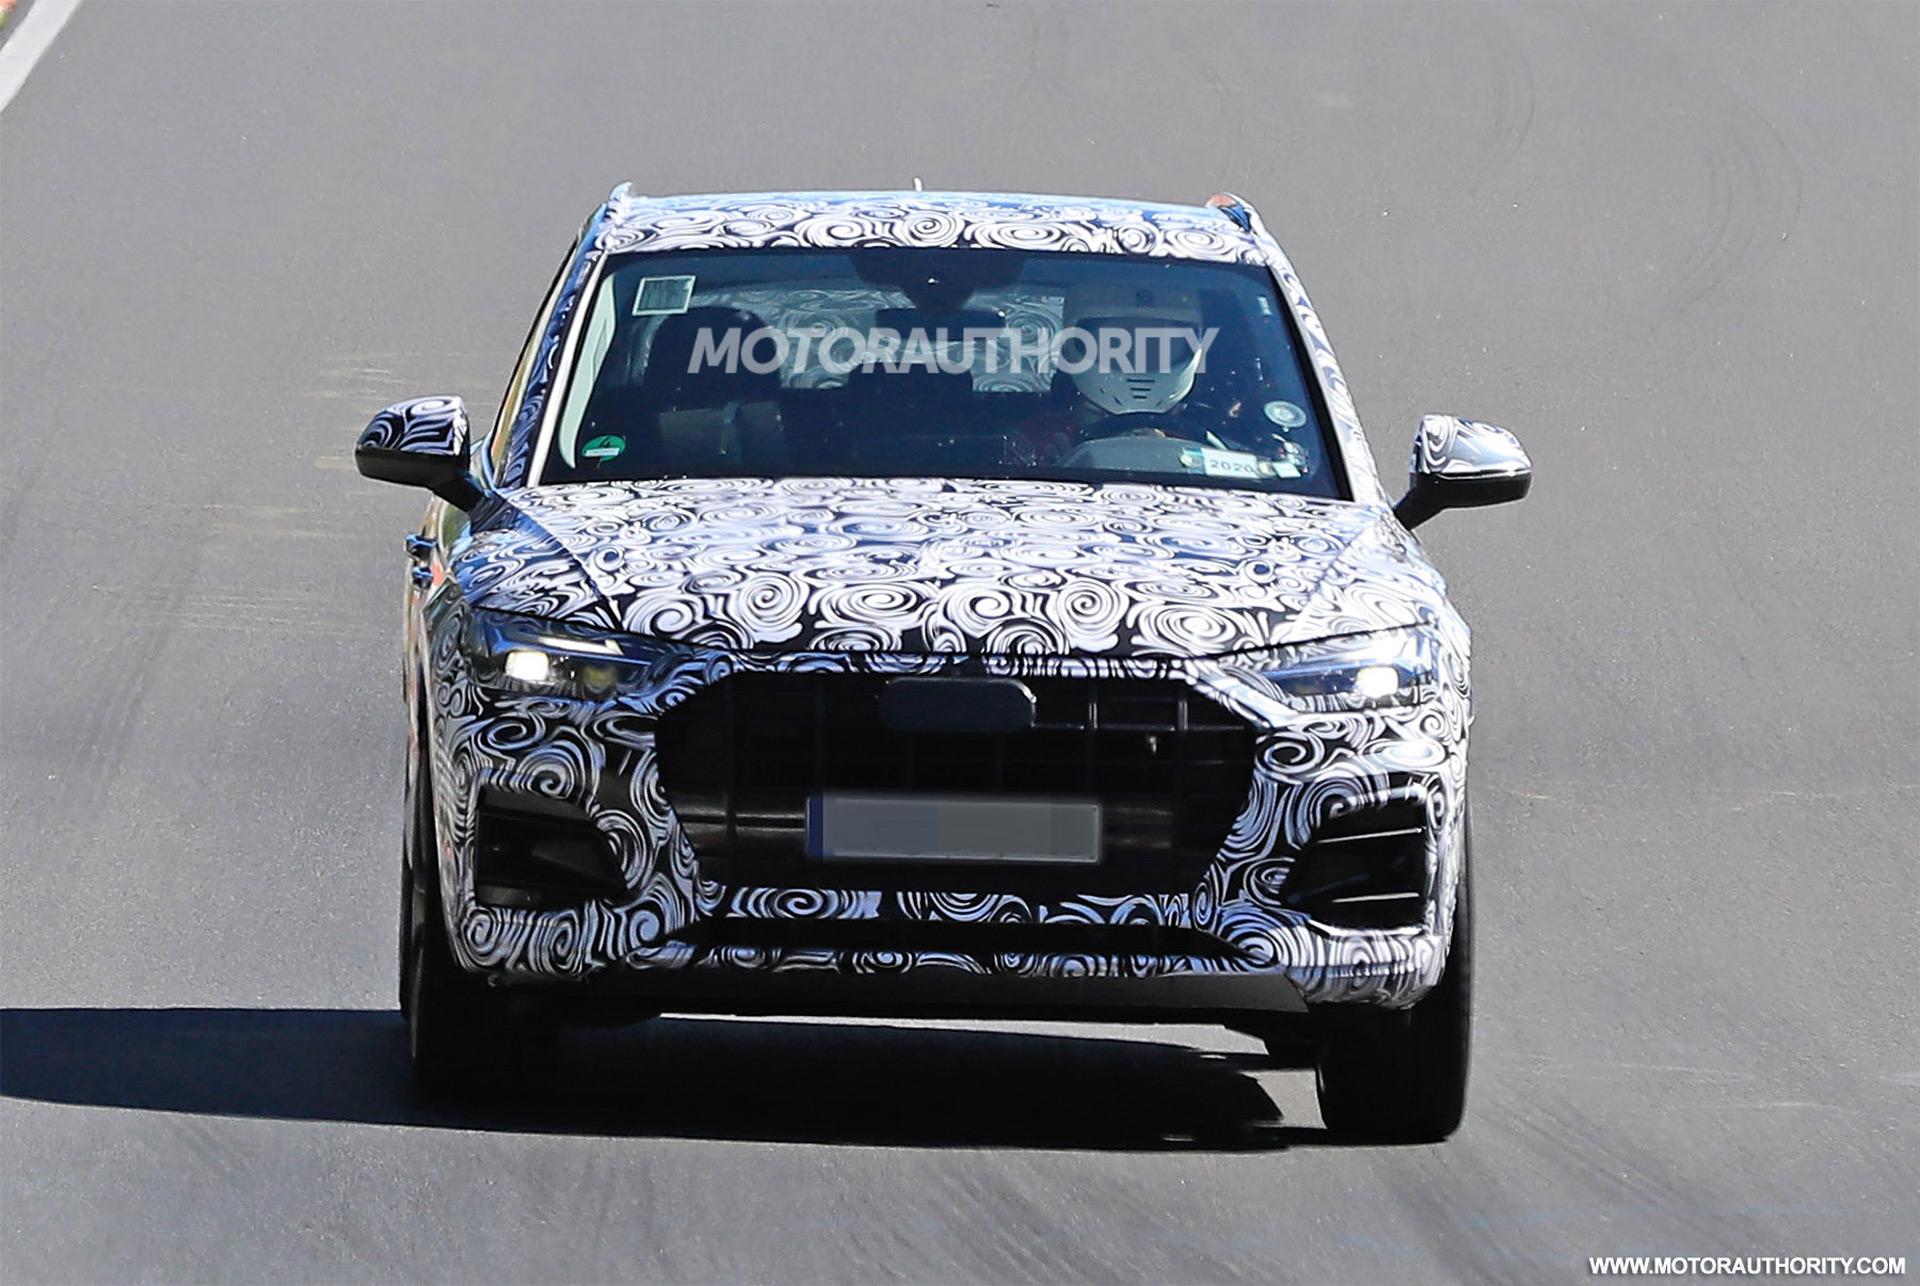 2020 - [Audi] Q5 Sportback - Page 7 2021-audi-q5-sportback-spy-shots--picture-credits-baldauf-sb-medien_100753276_h